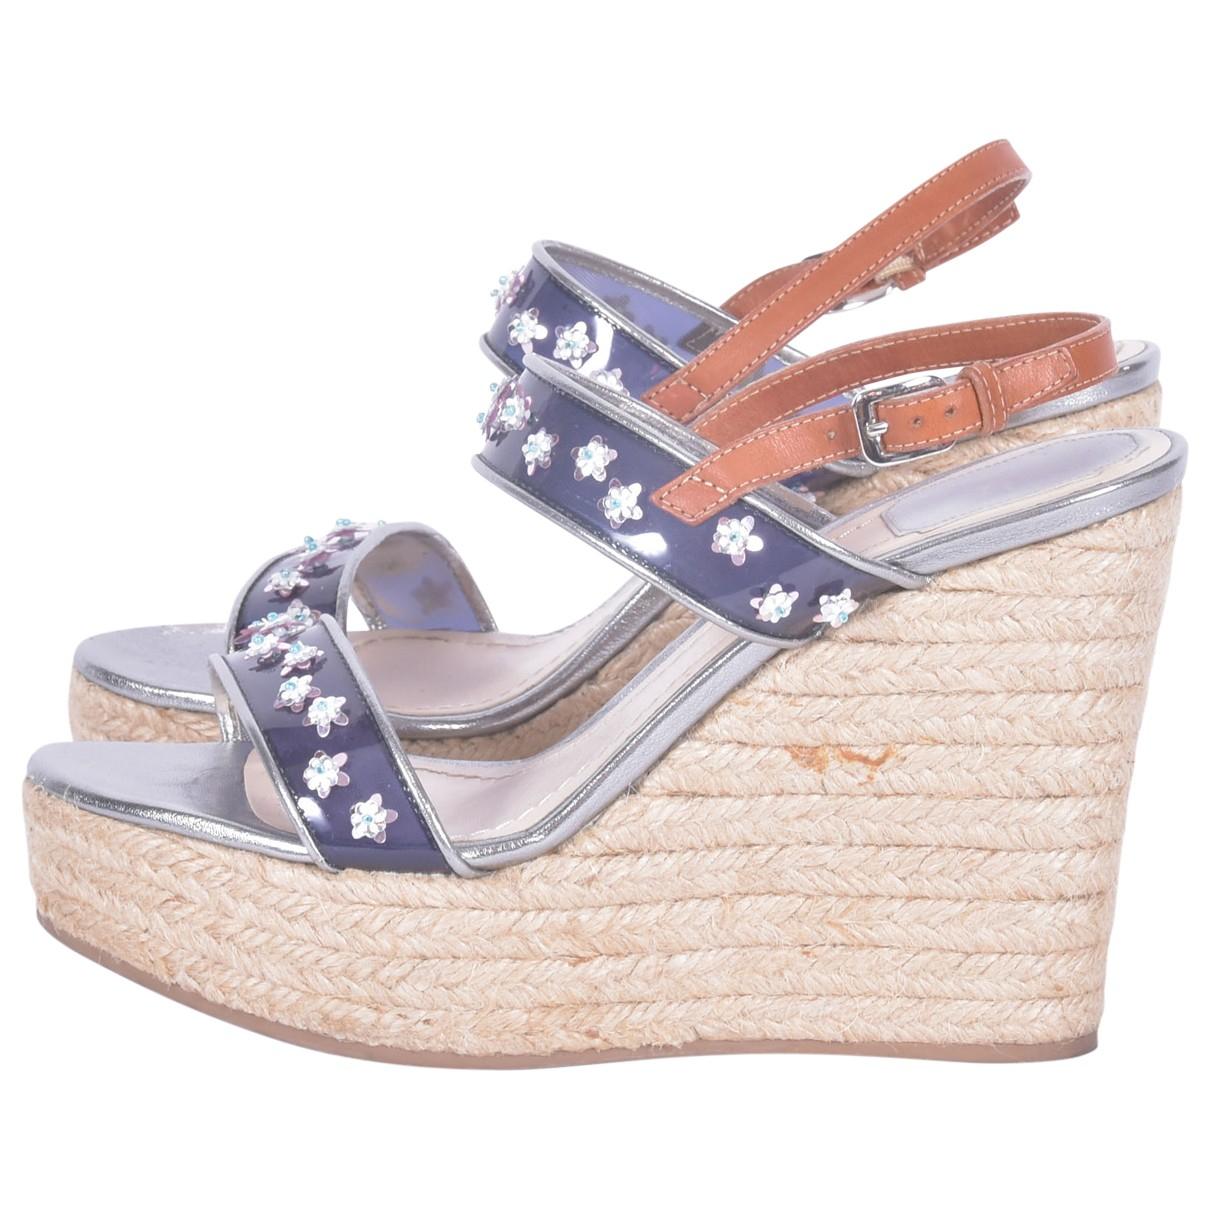 Dior \N Sandalen in  Blau Lackleder